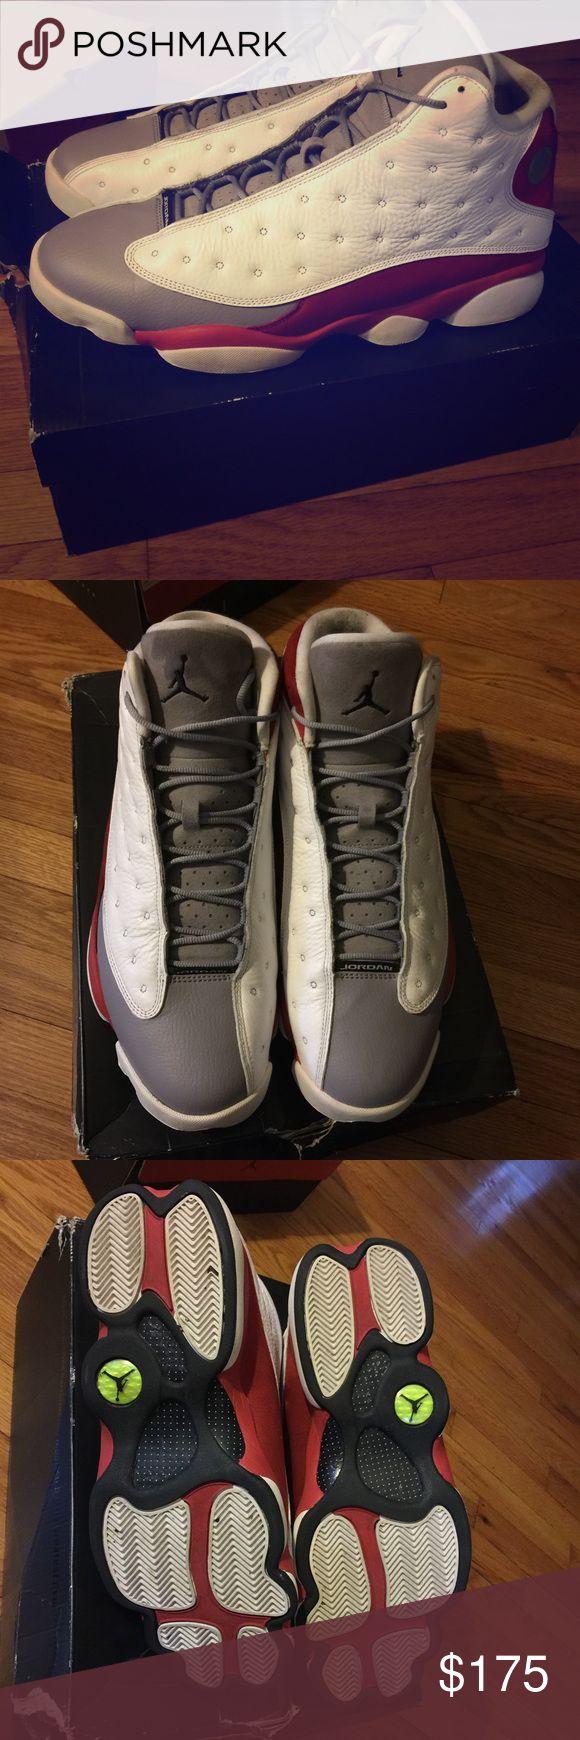 Retro Jordan 13 Slightly worn retro 13 jordans size 14 Jordan Shoes Sneakers